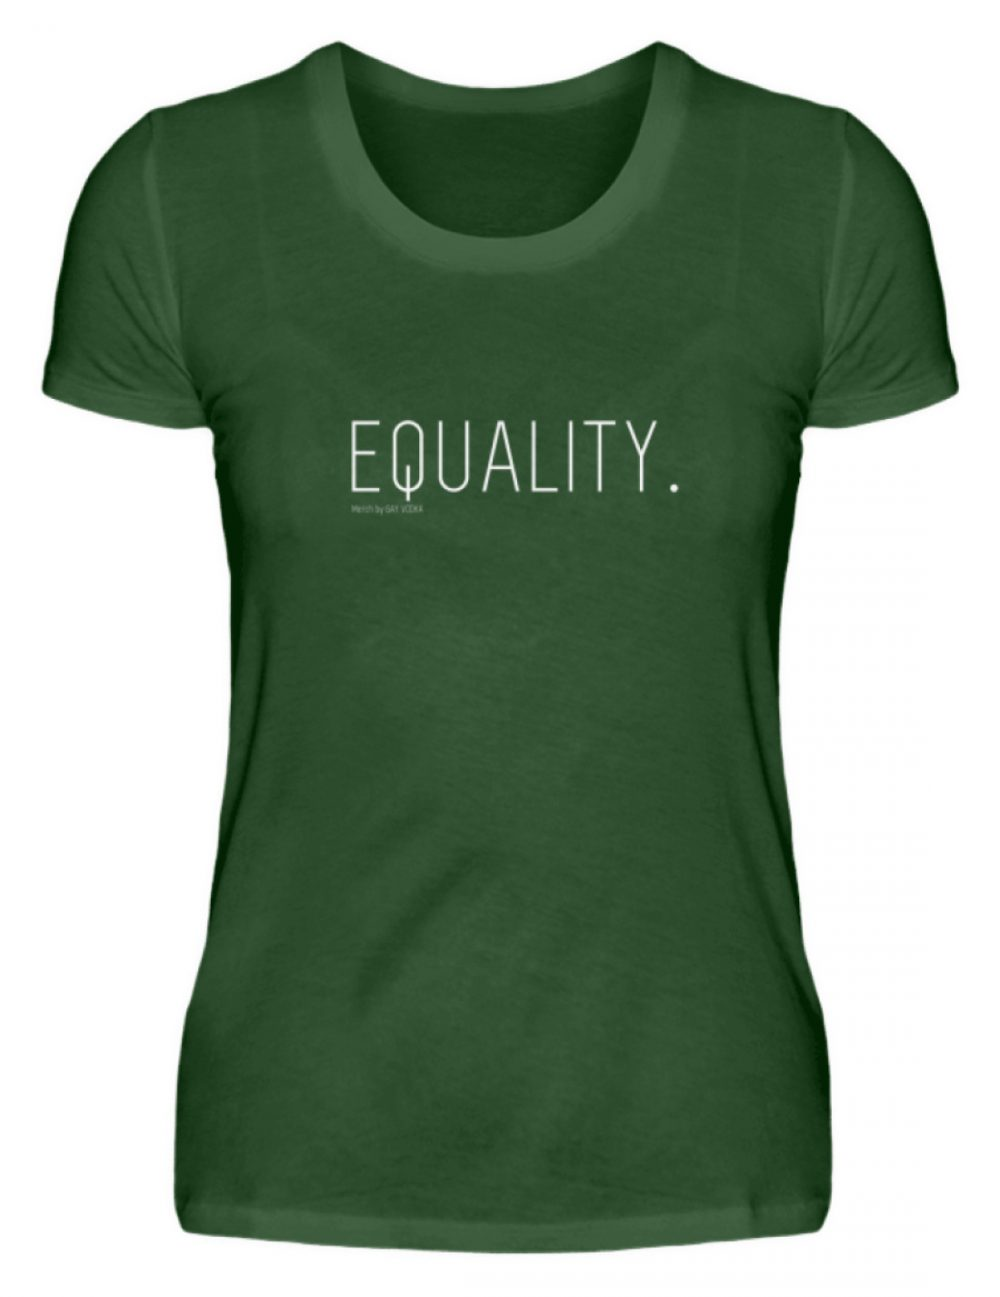 EQUALITY. - Damen Premiumshirt-2936